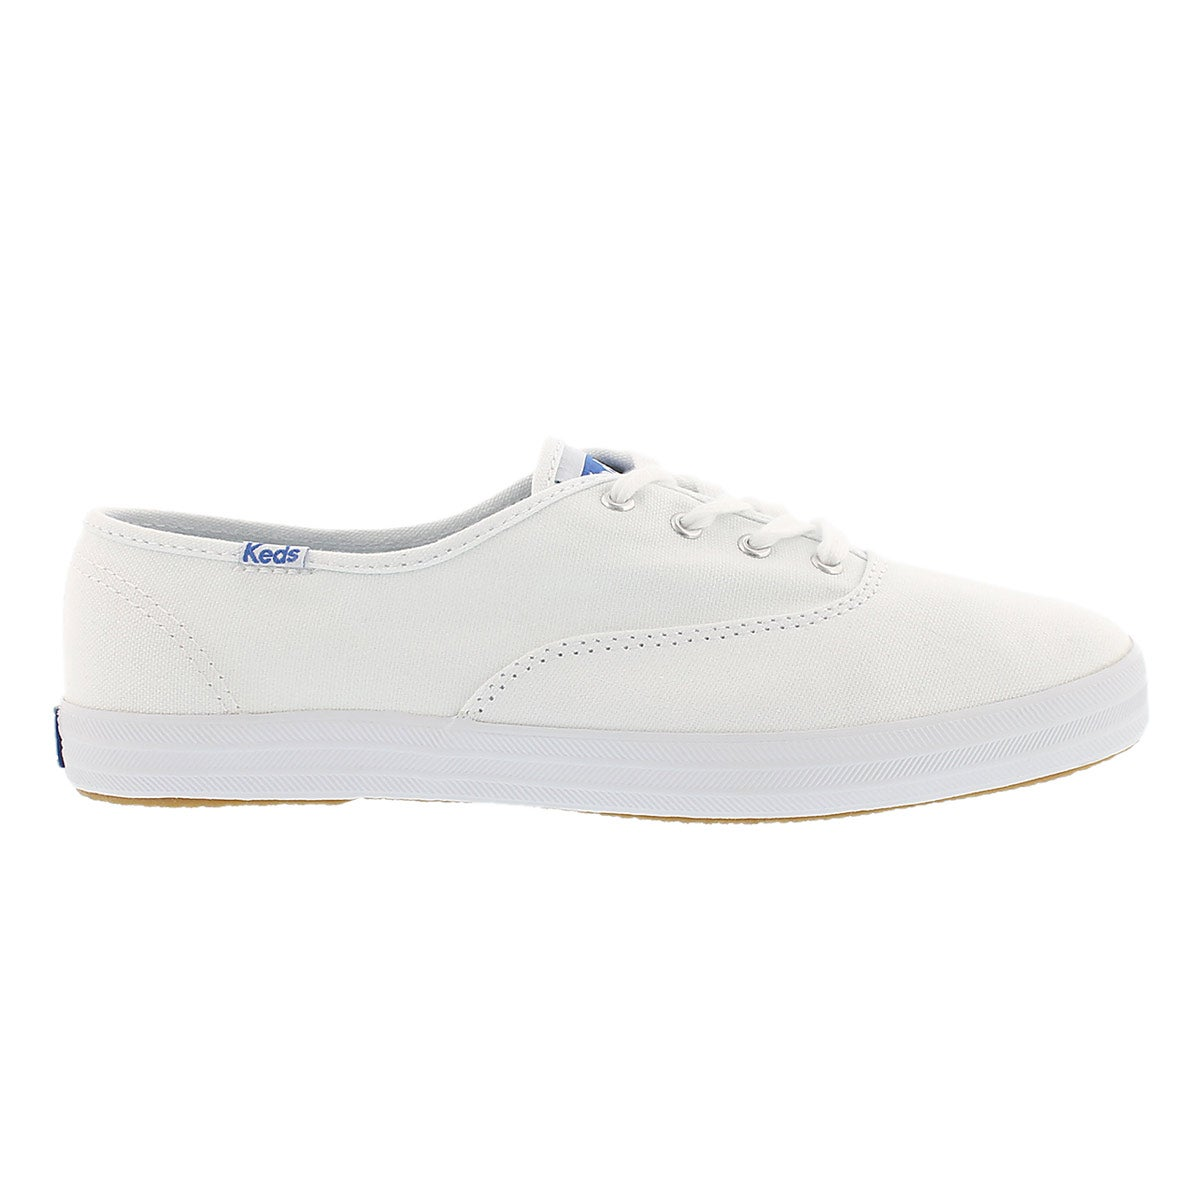 Lds Champion wht canvas sneaker- X Wide